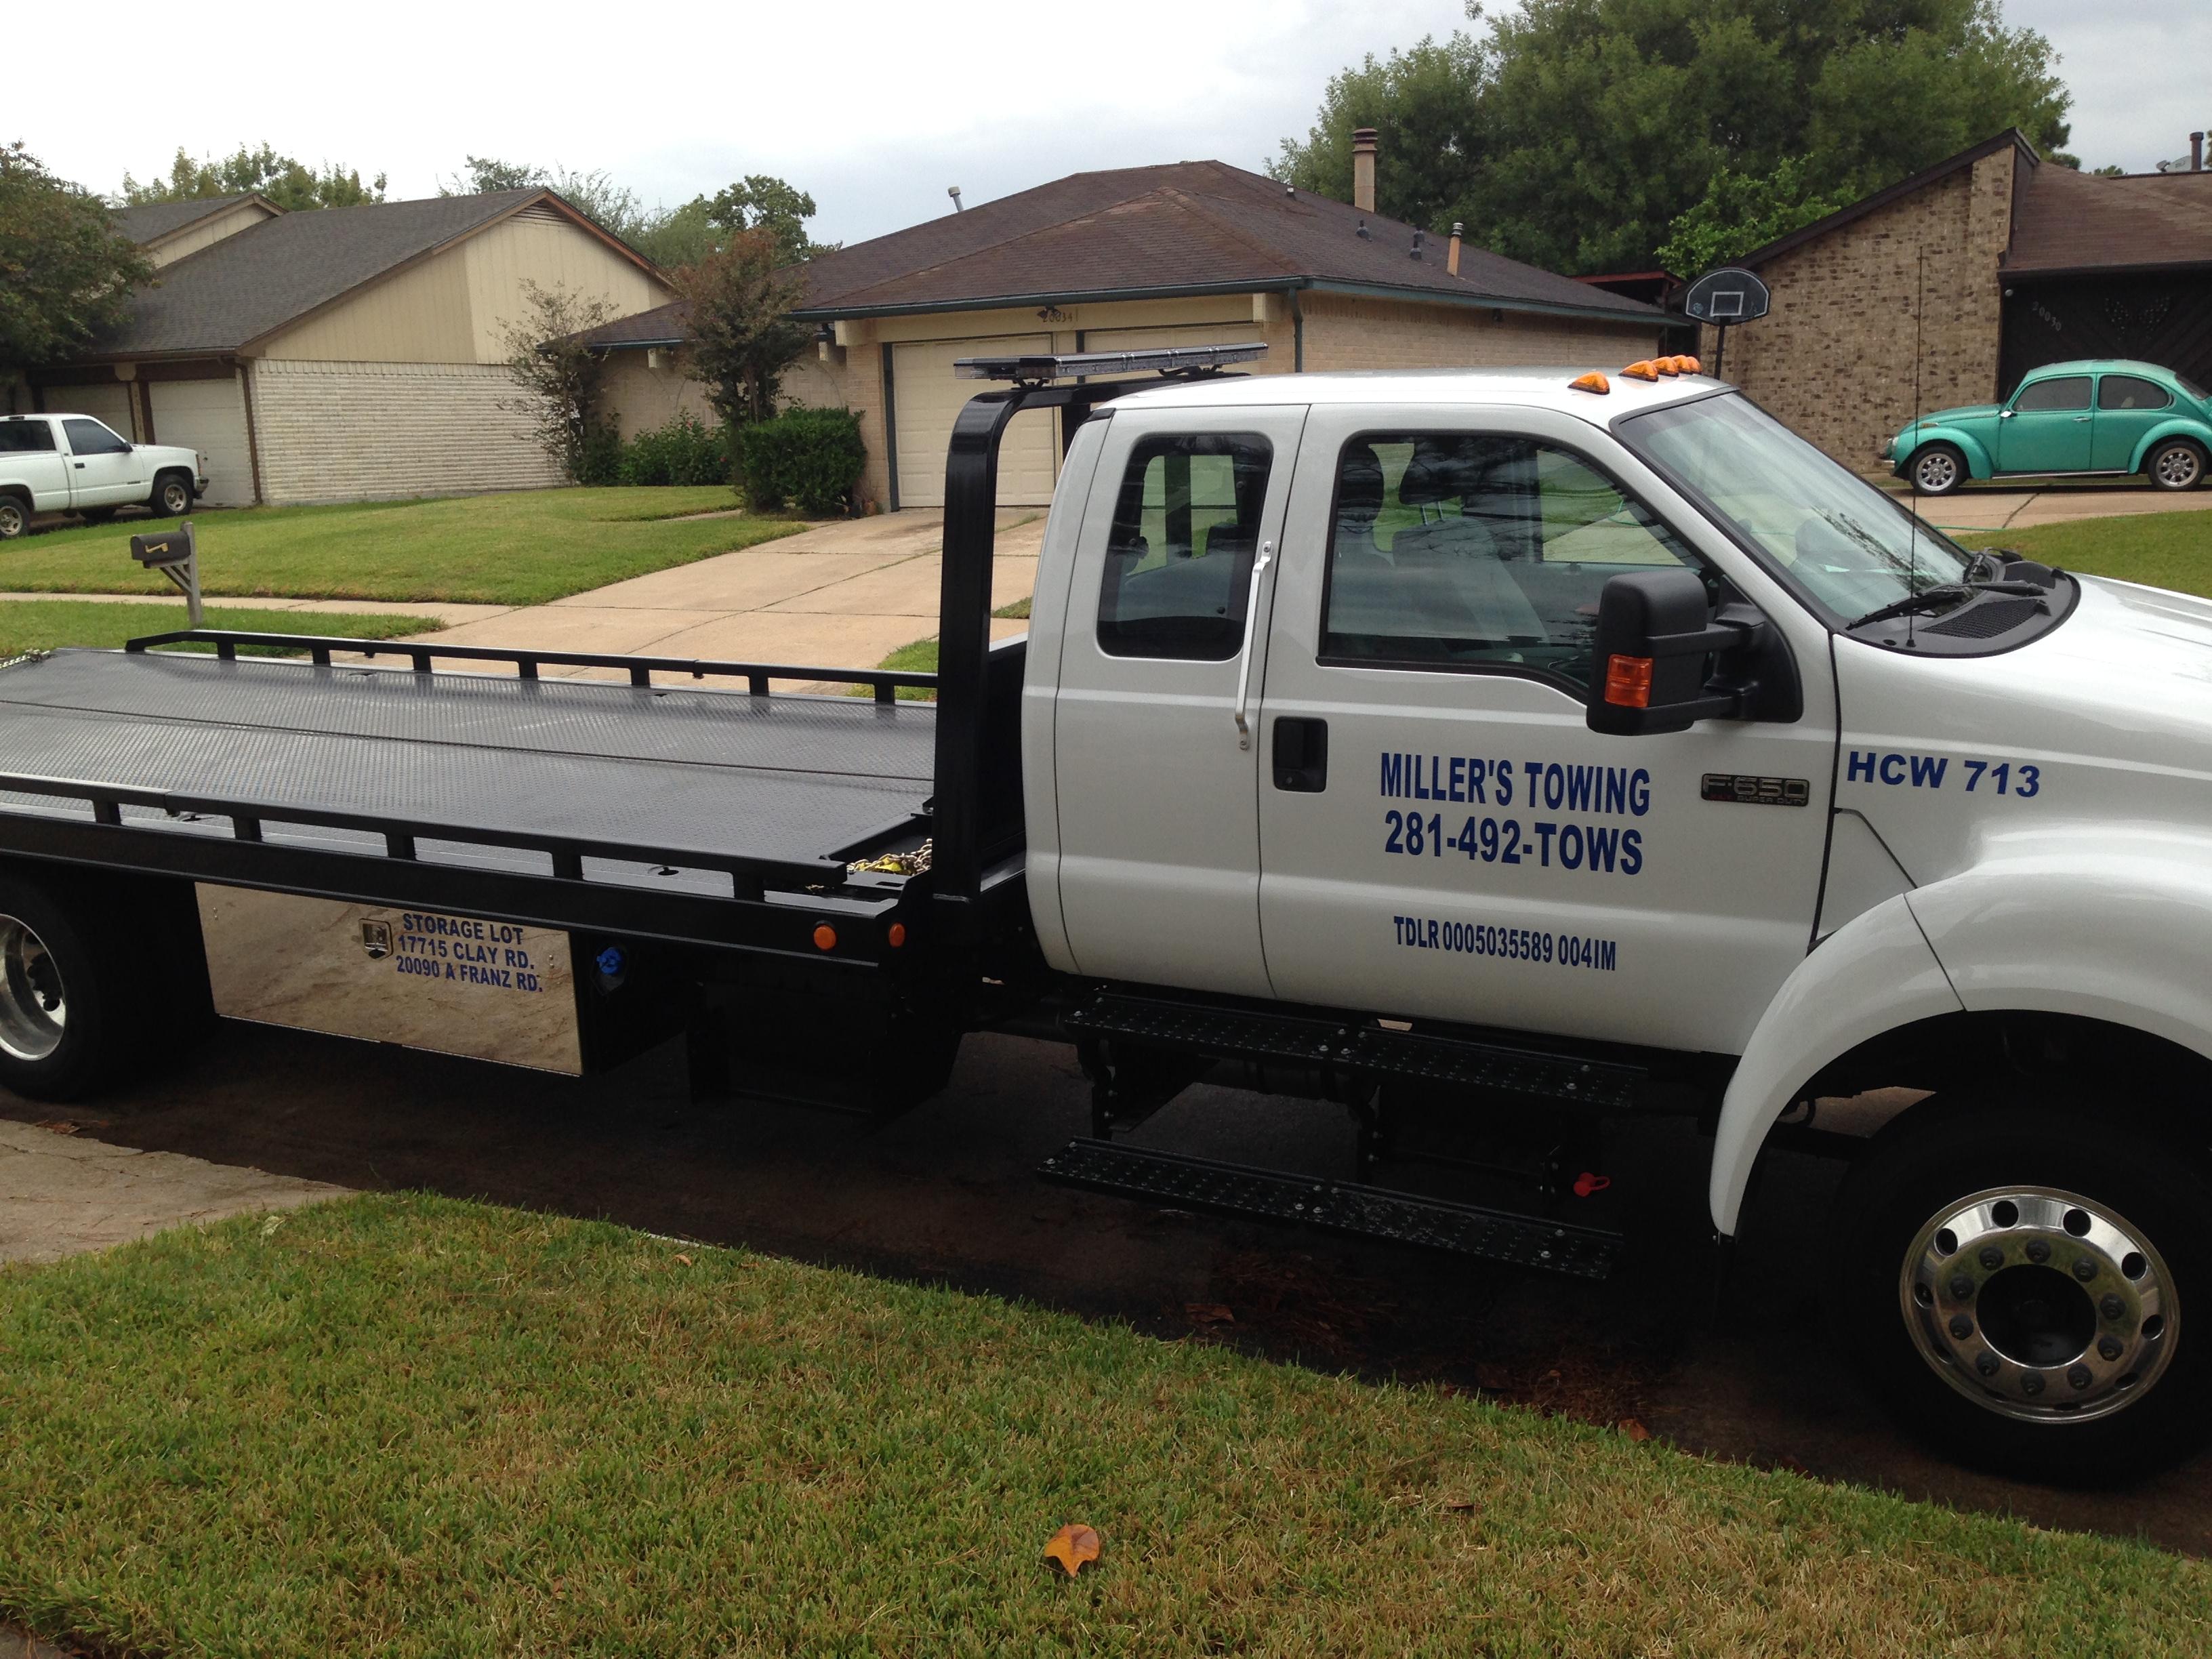 Millers Towing - Katy, TX